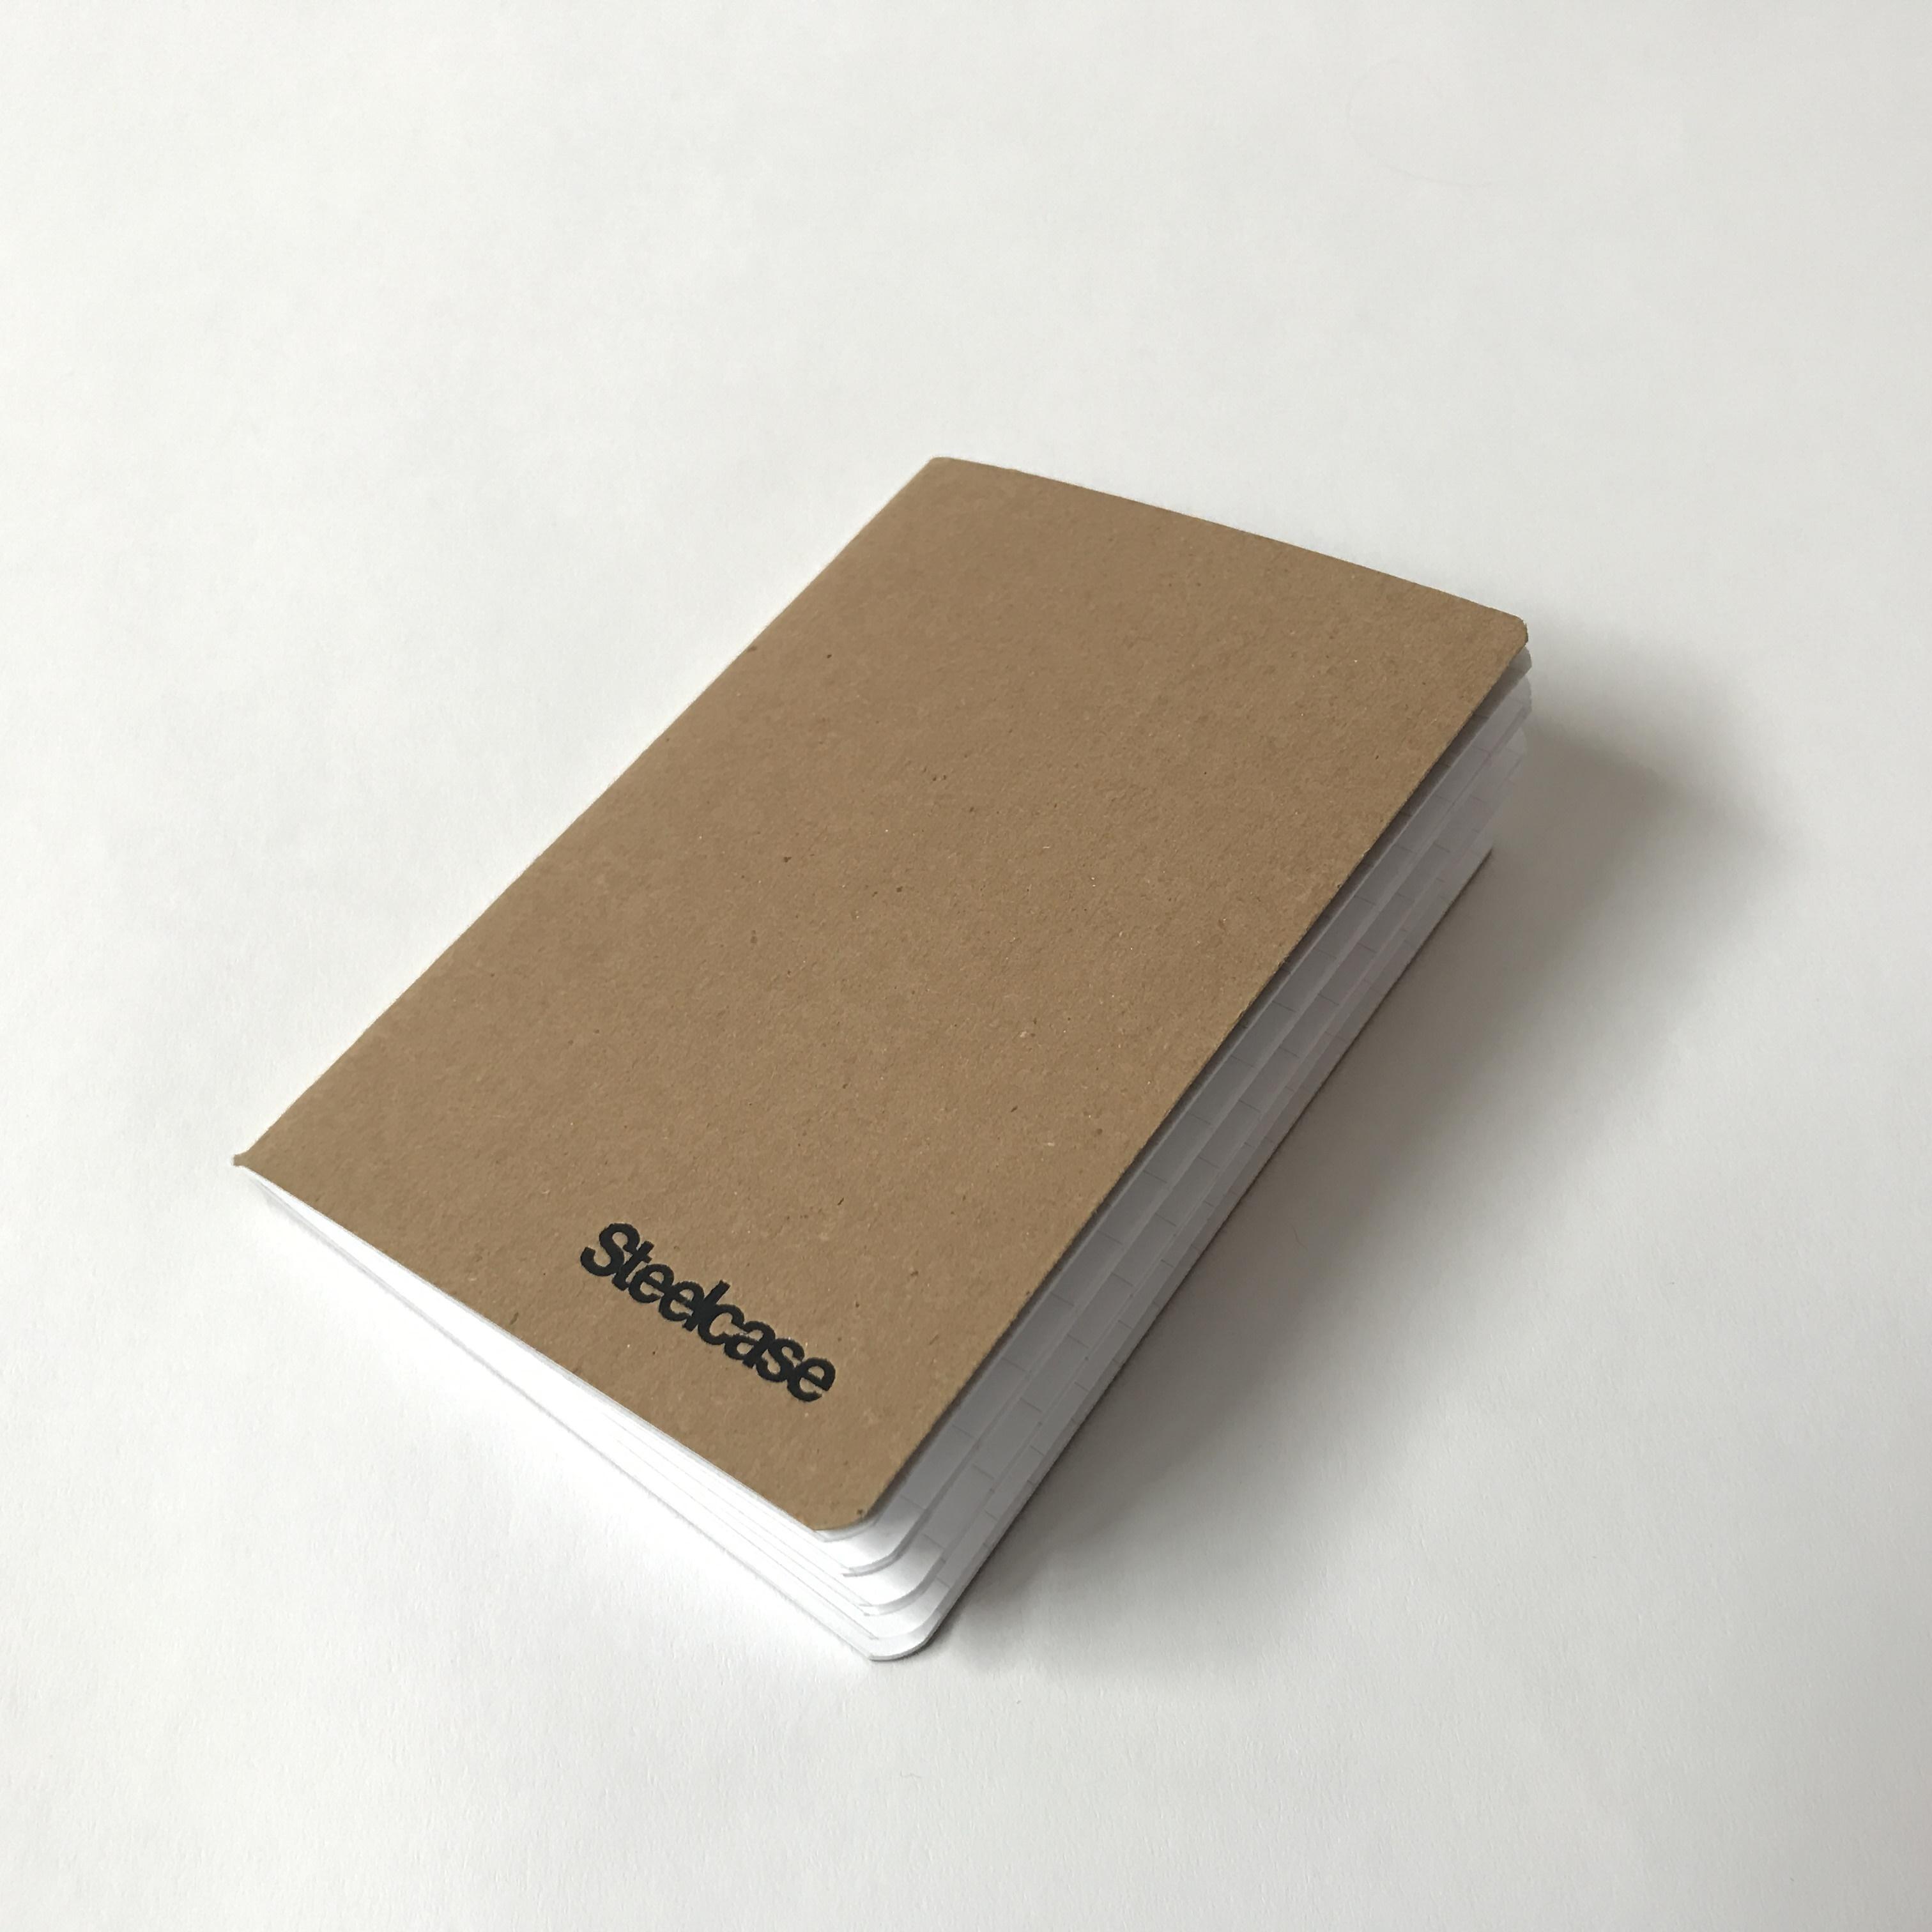 17-0005315_MiniKraftNotebook